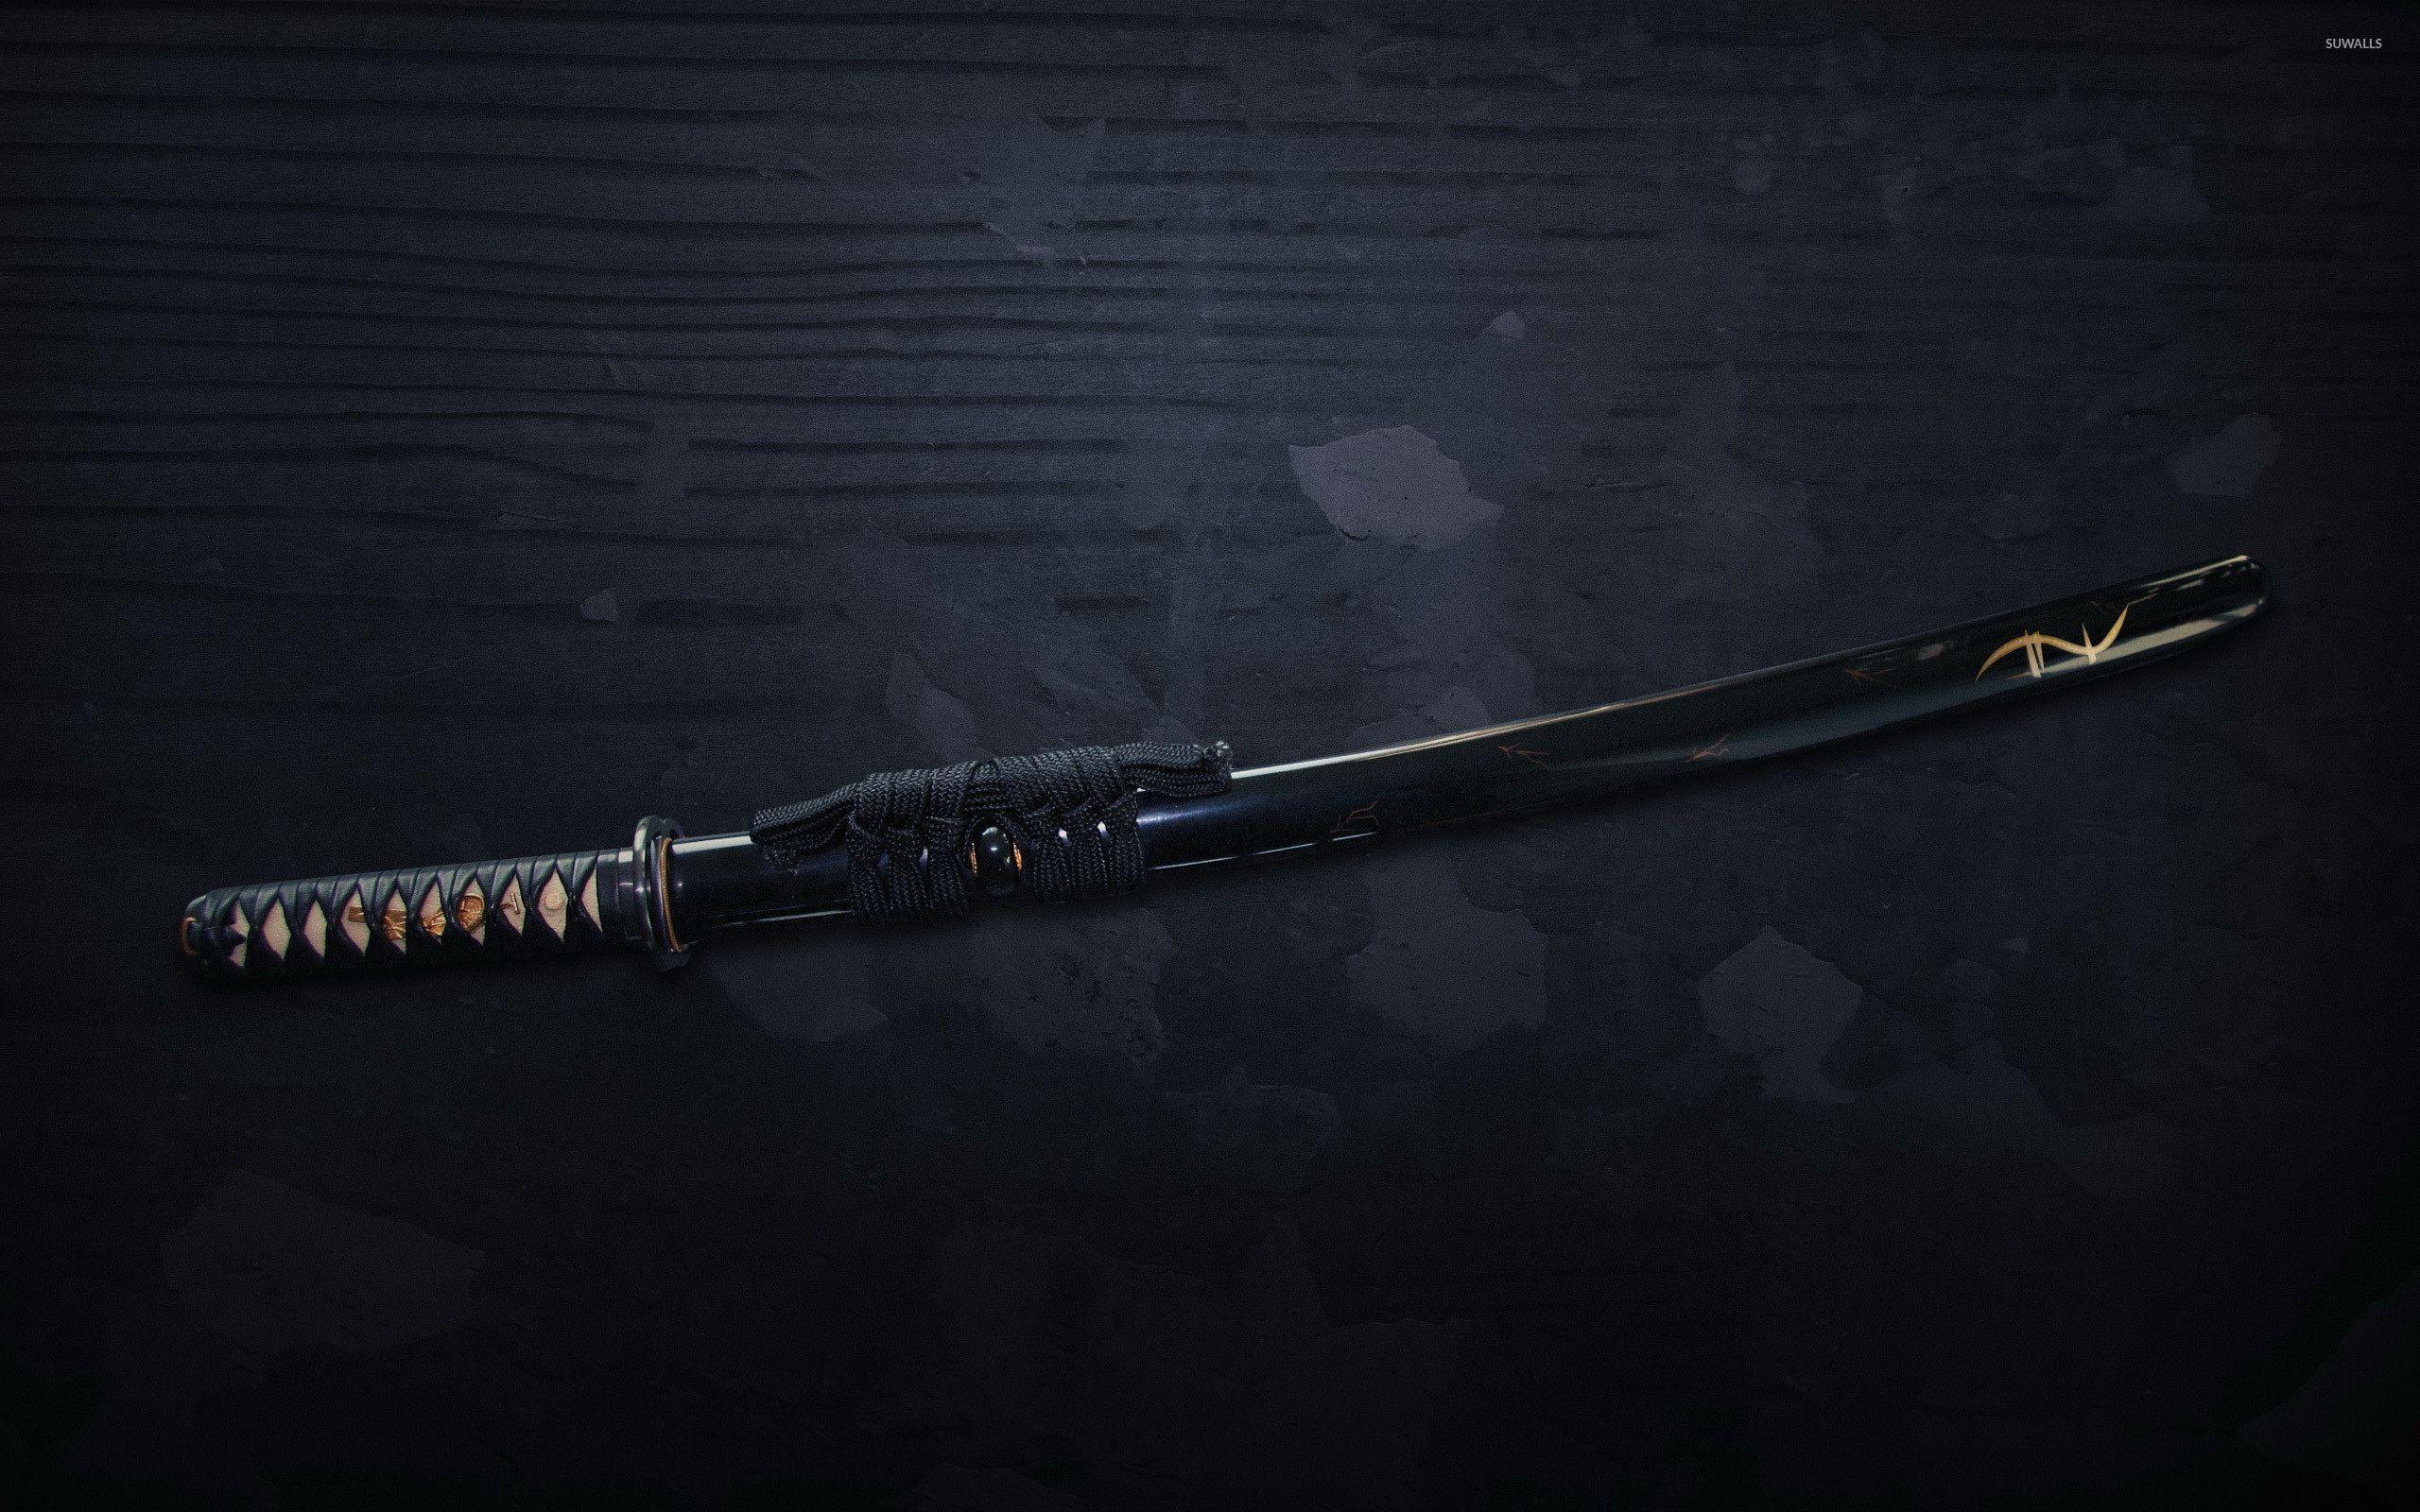 Black sword wallpaper - Photography wallpapers - #54186